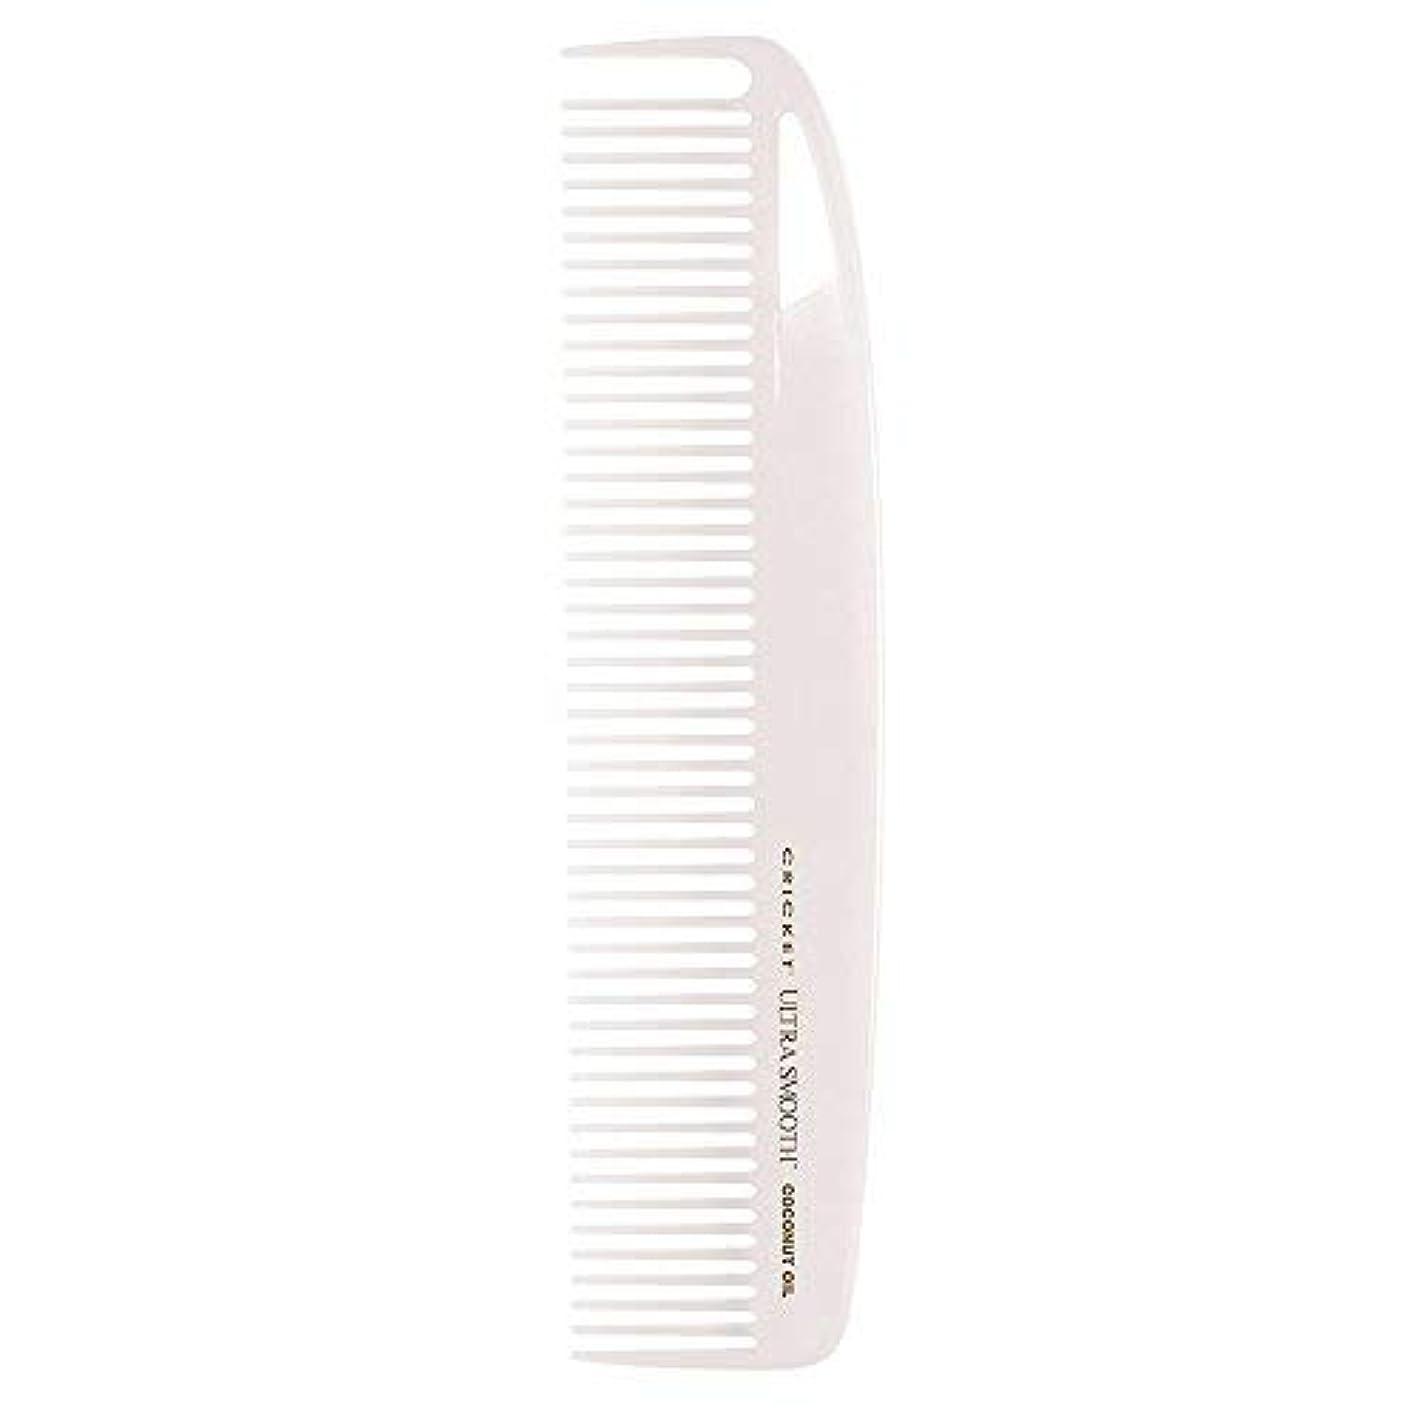 解任試用変更可能Ultra Smooth Coconut Dressing Comb [並行輸入品]